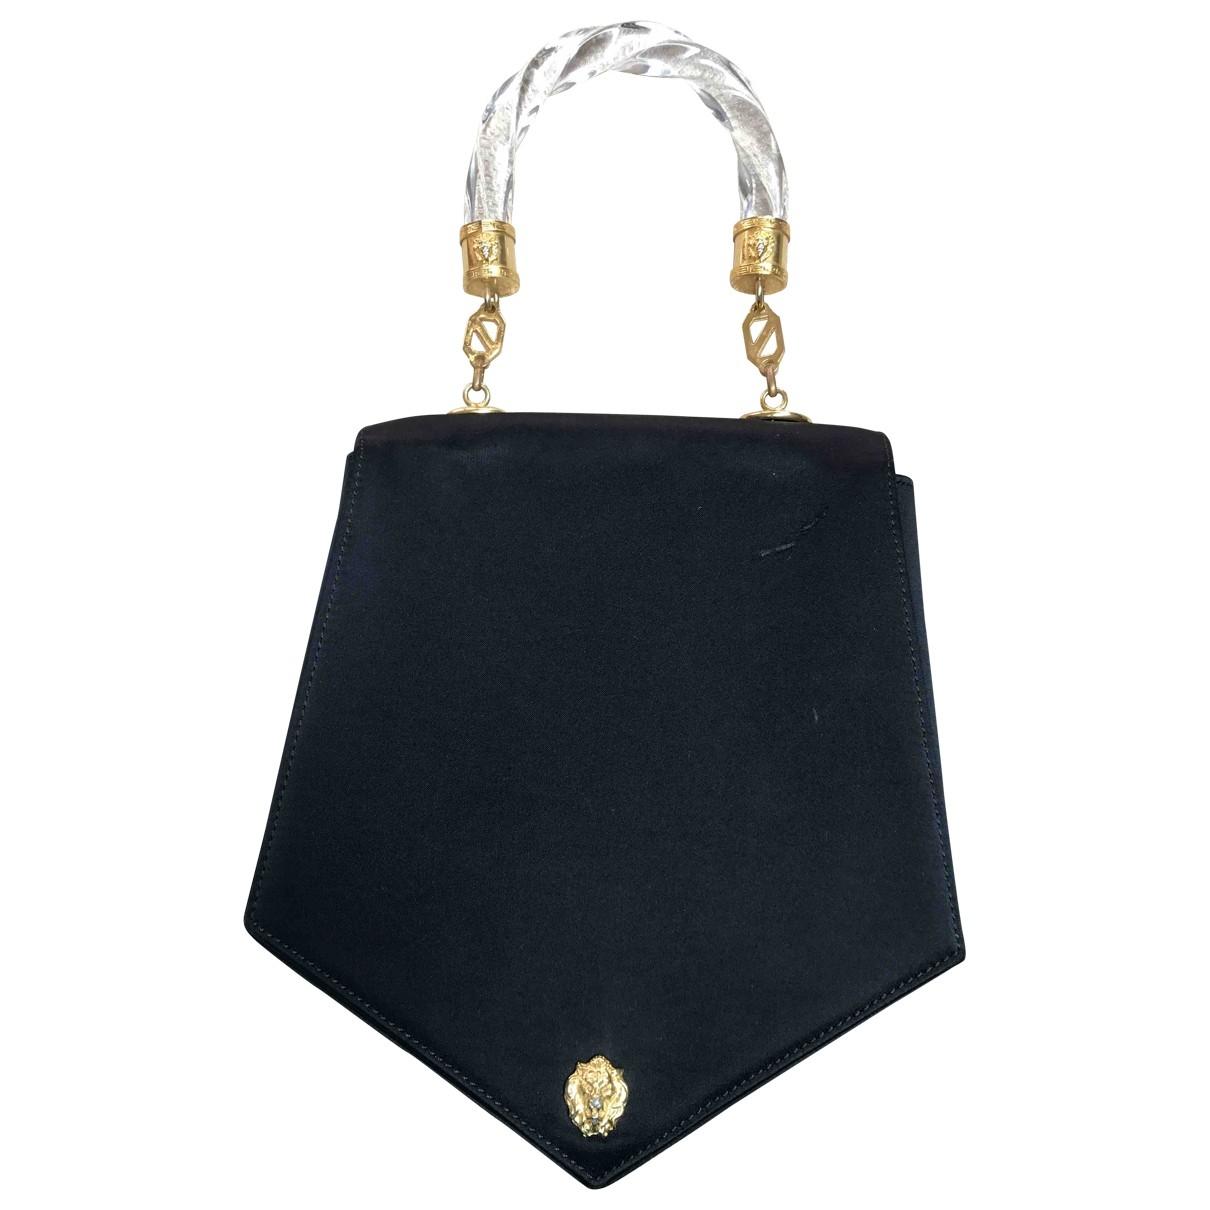 Versus \N Handtasche in  Schwarz Leinen